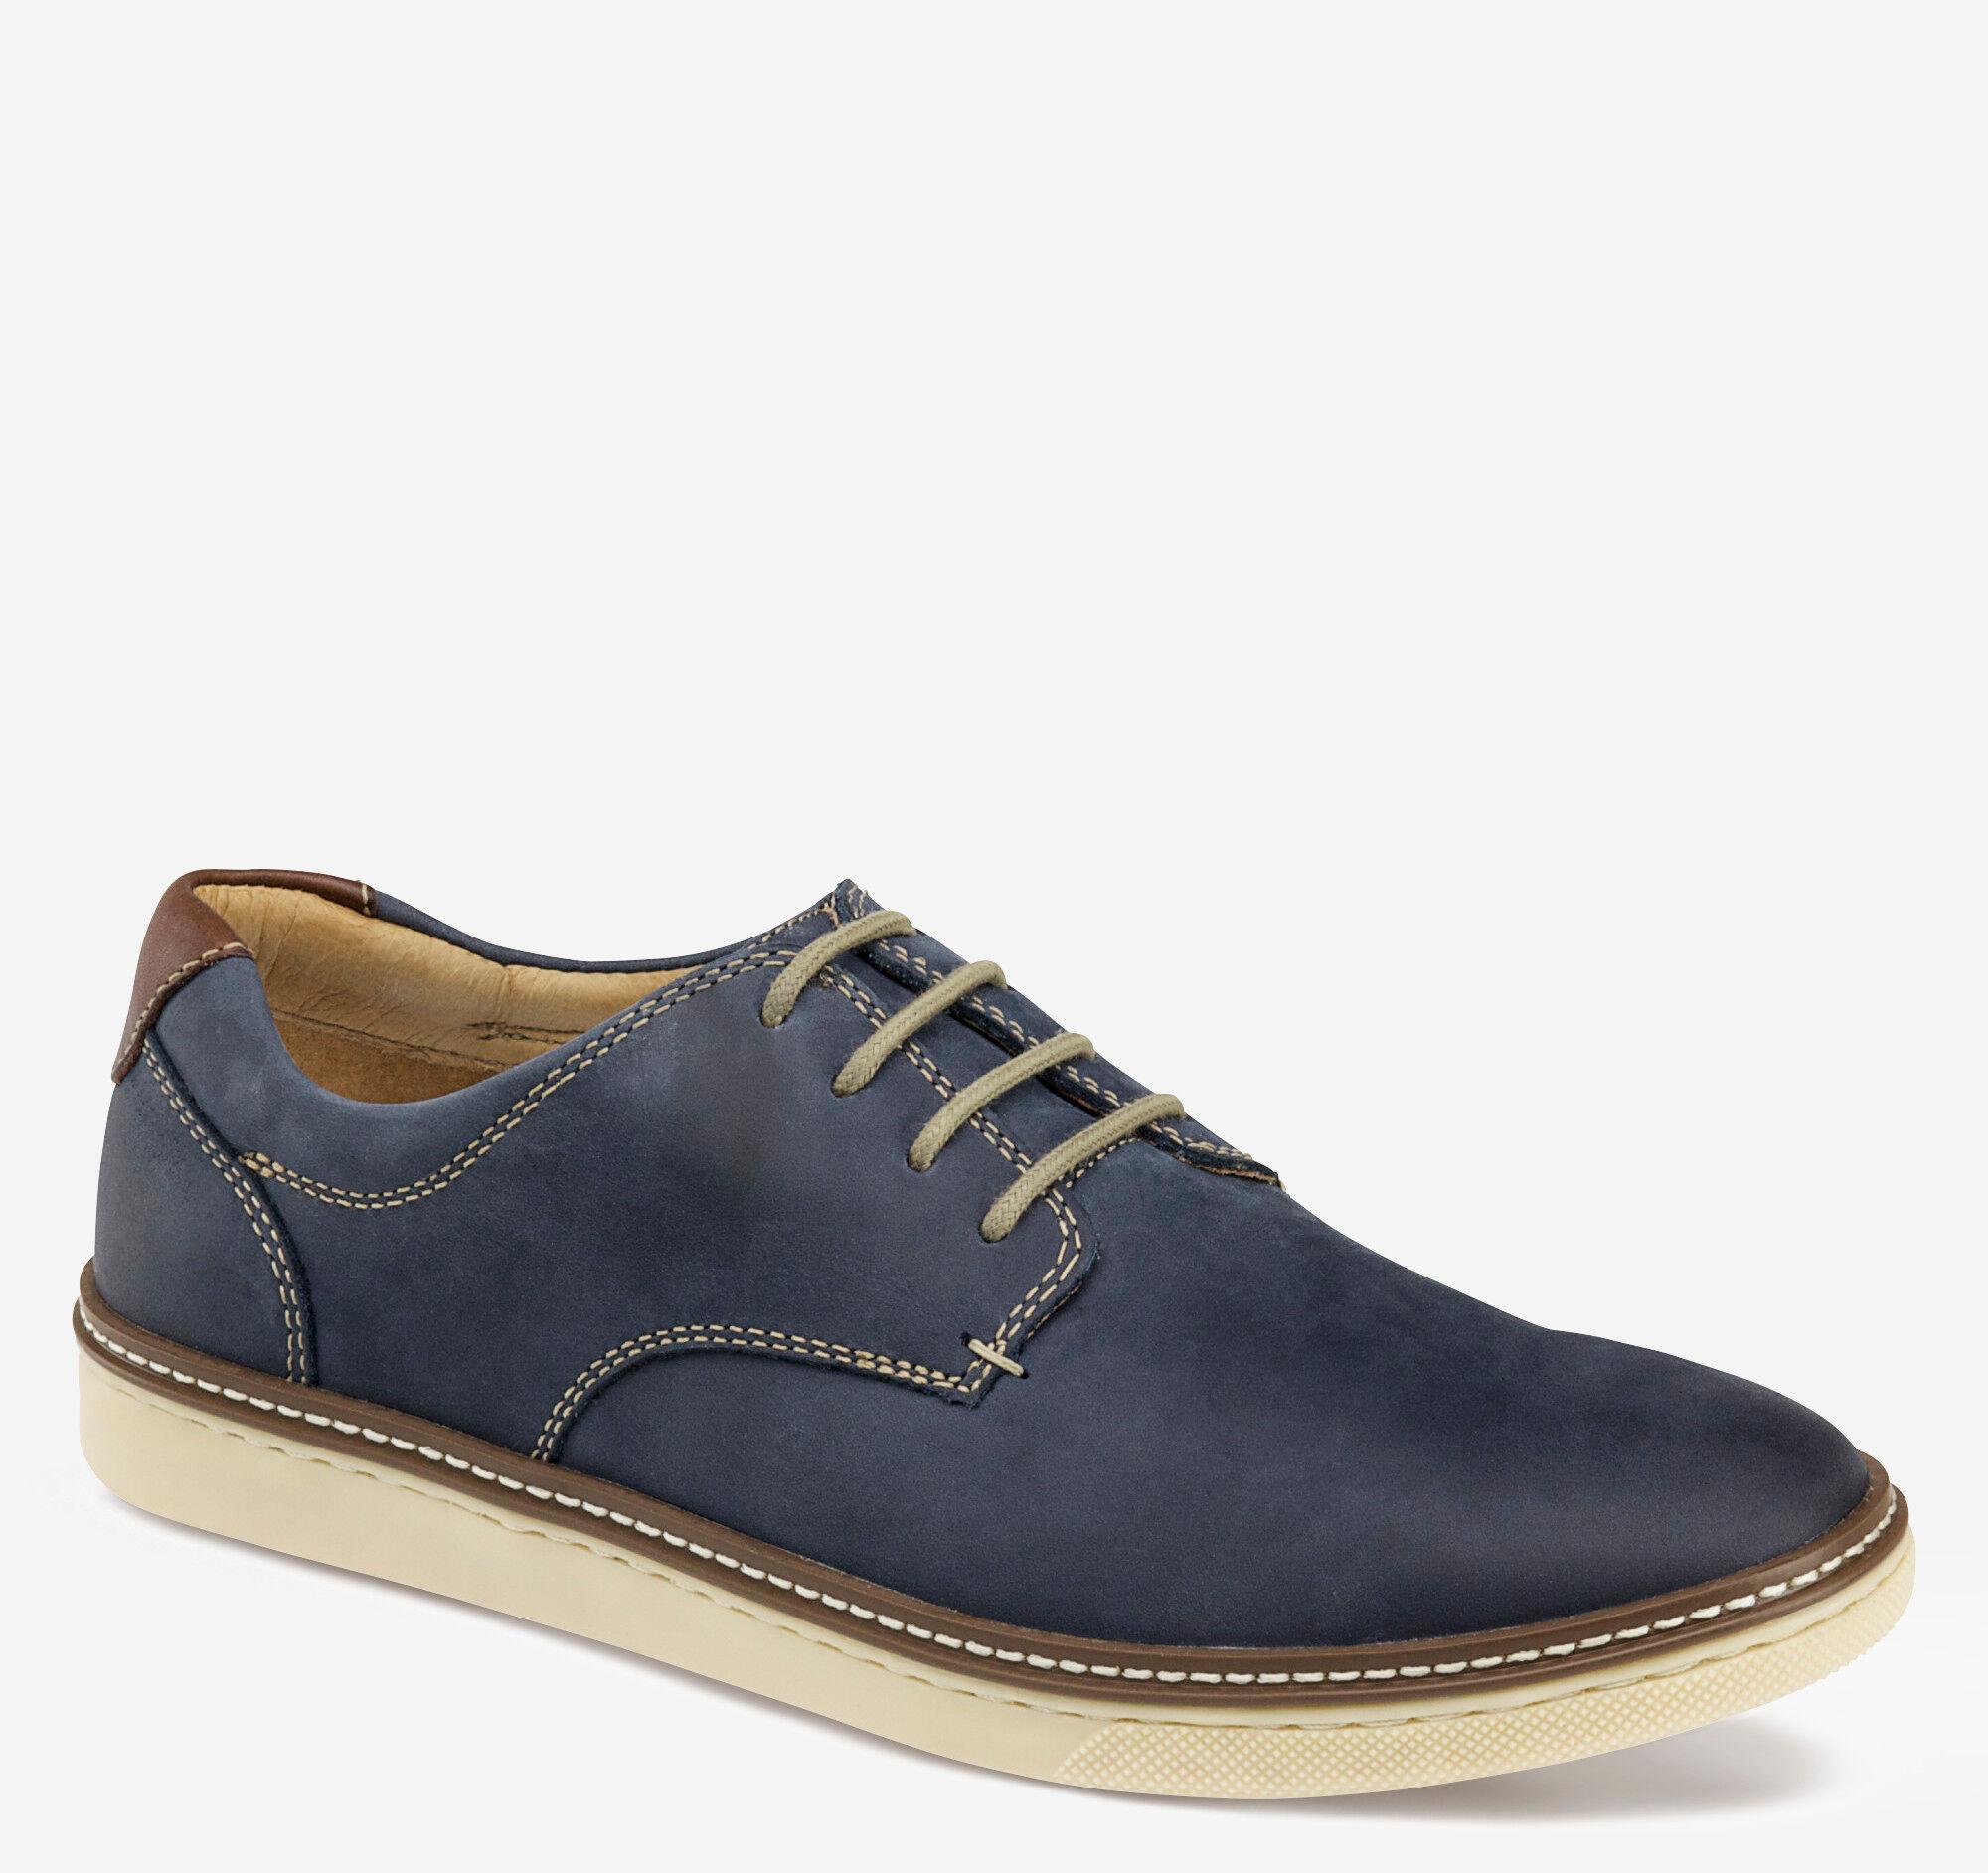 Johnston & Murphy Men's McGuffey Plain Toe Shoe - Navy Oiled Full Grain - Size 12 - M